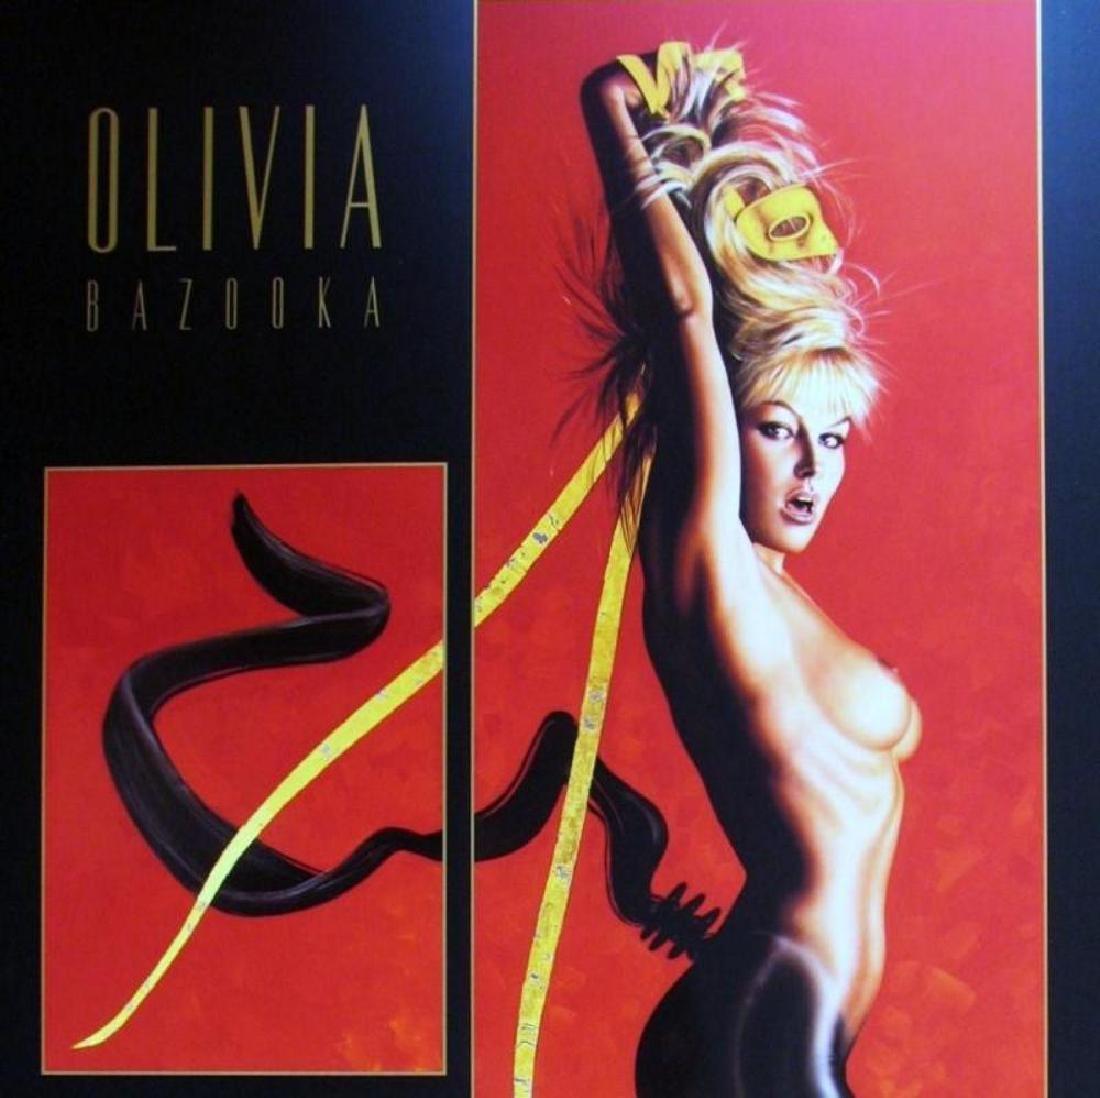 Olivia Pin Up Print Erotic Nude Large Dealer - 2